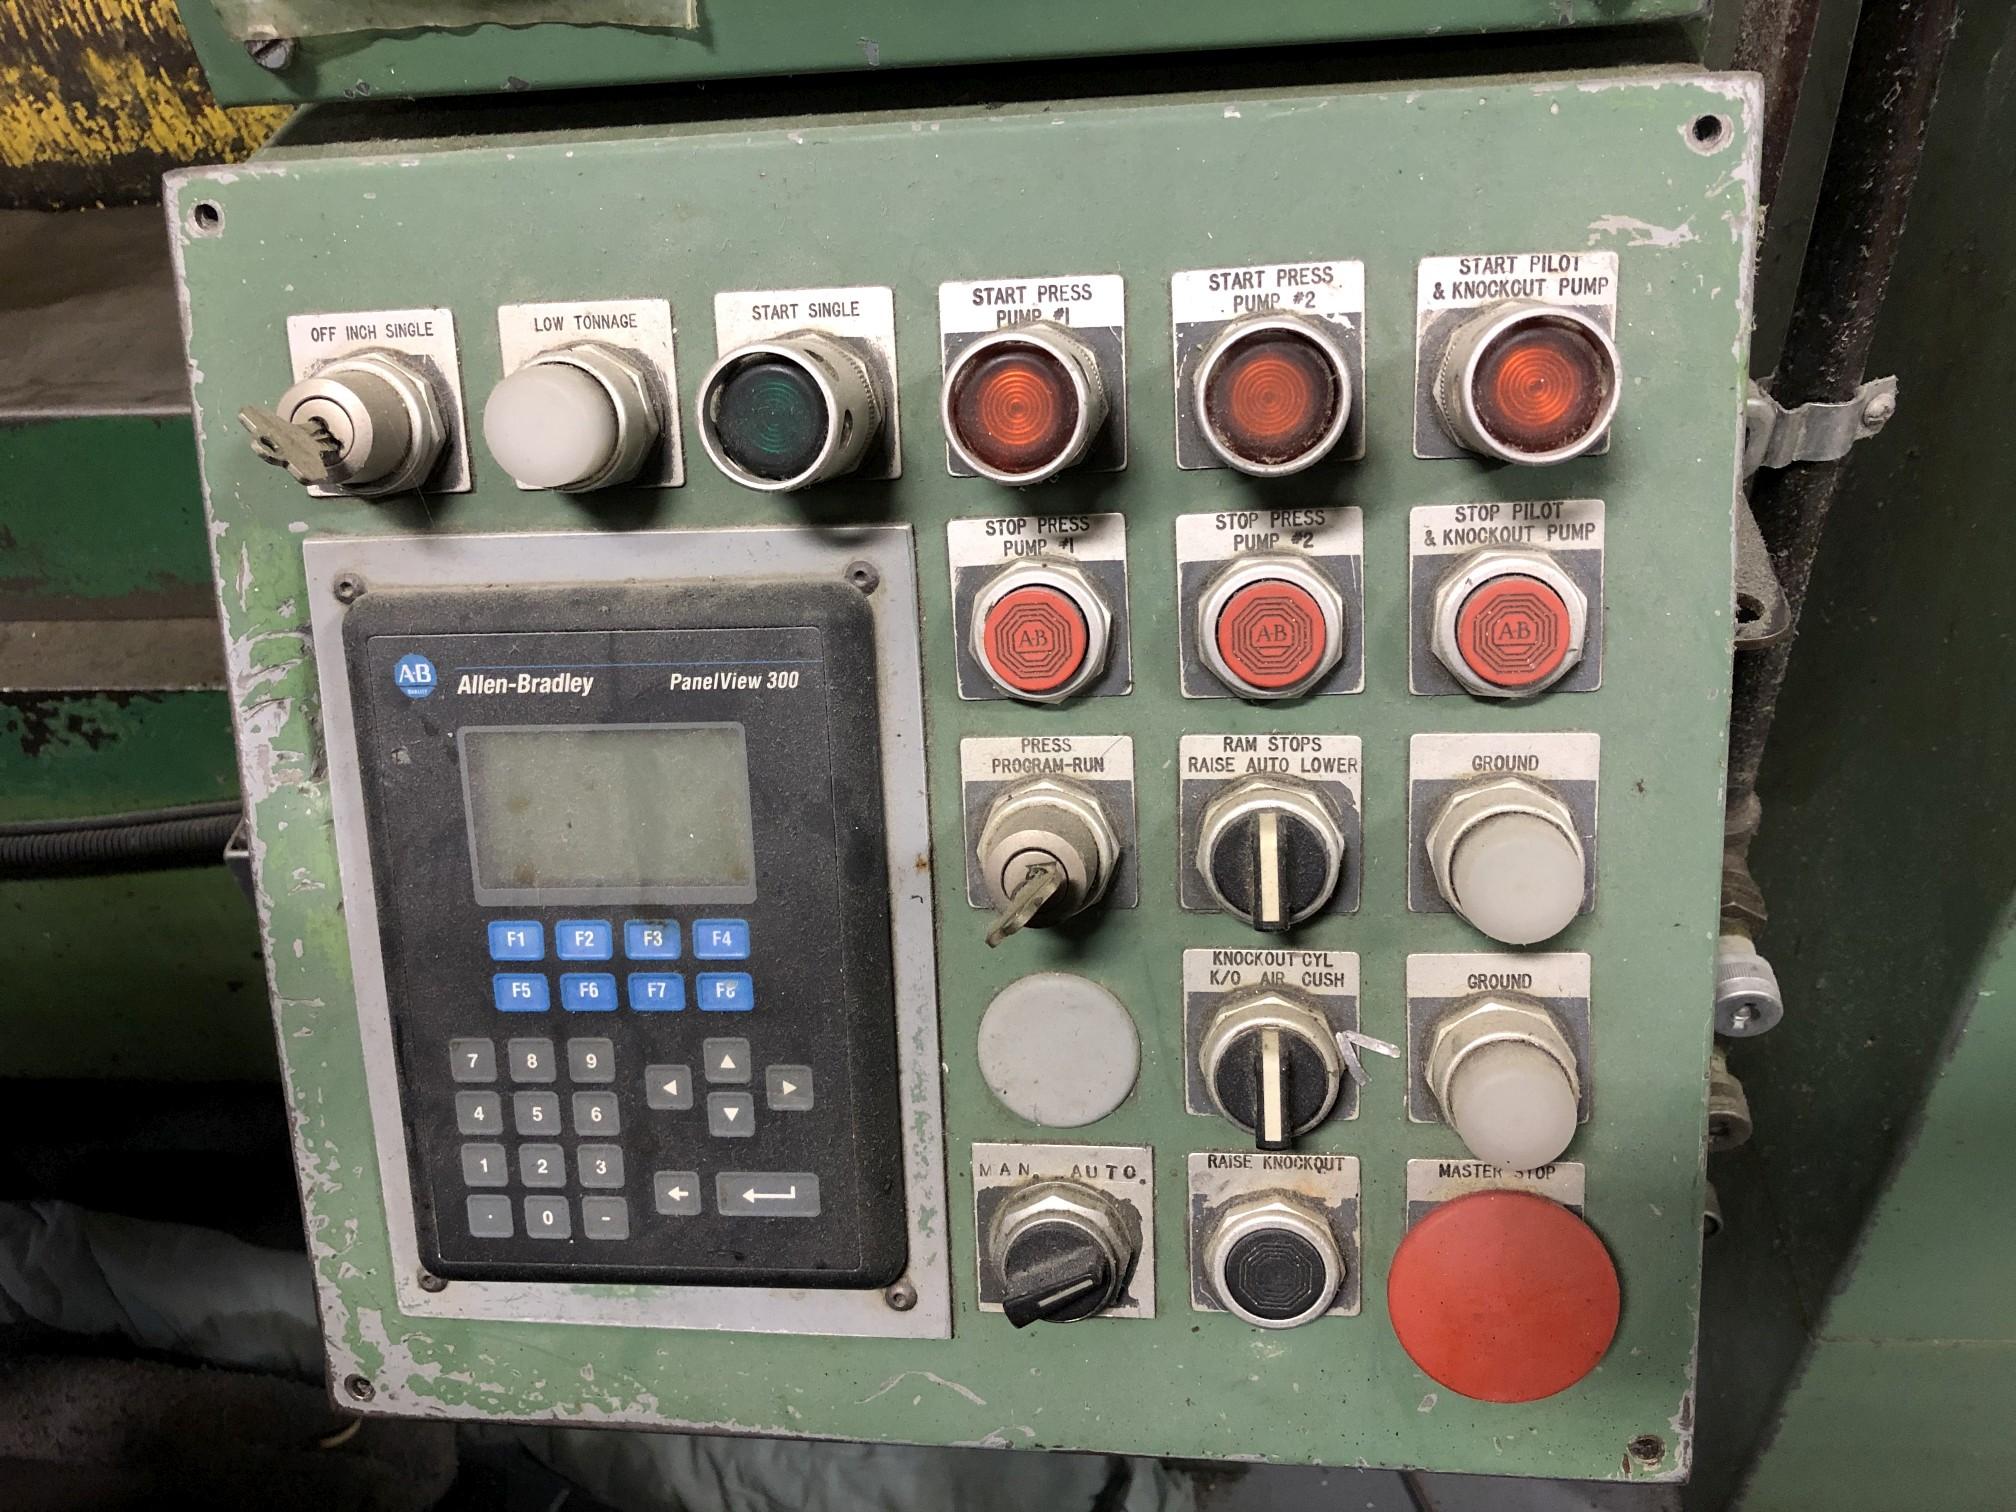 570 Ton Advanced Machine Design Straight Side Press - Image 7 of 15